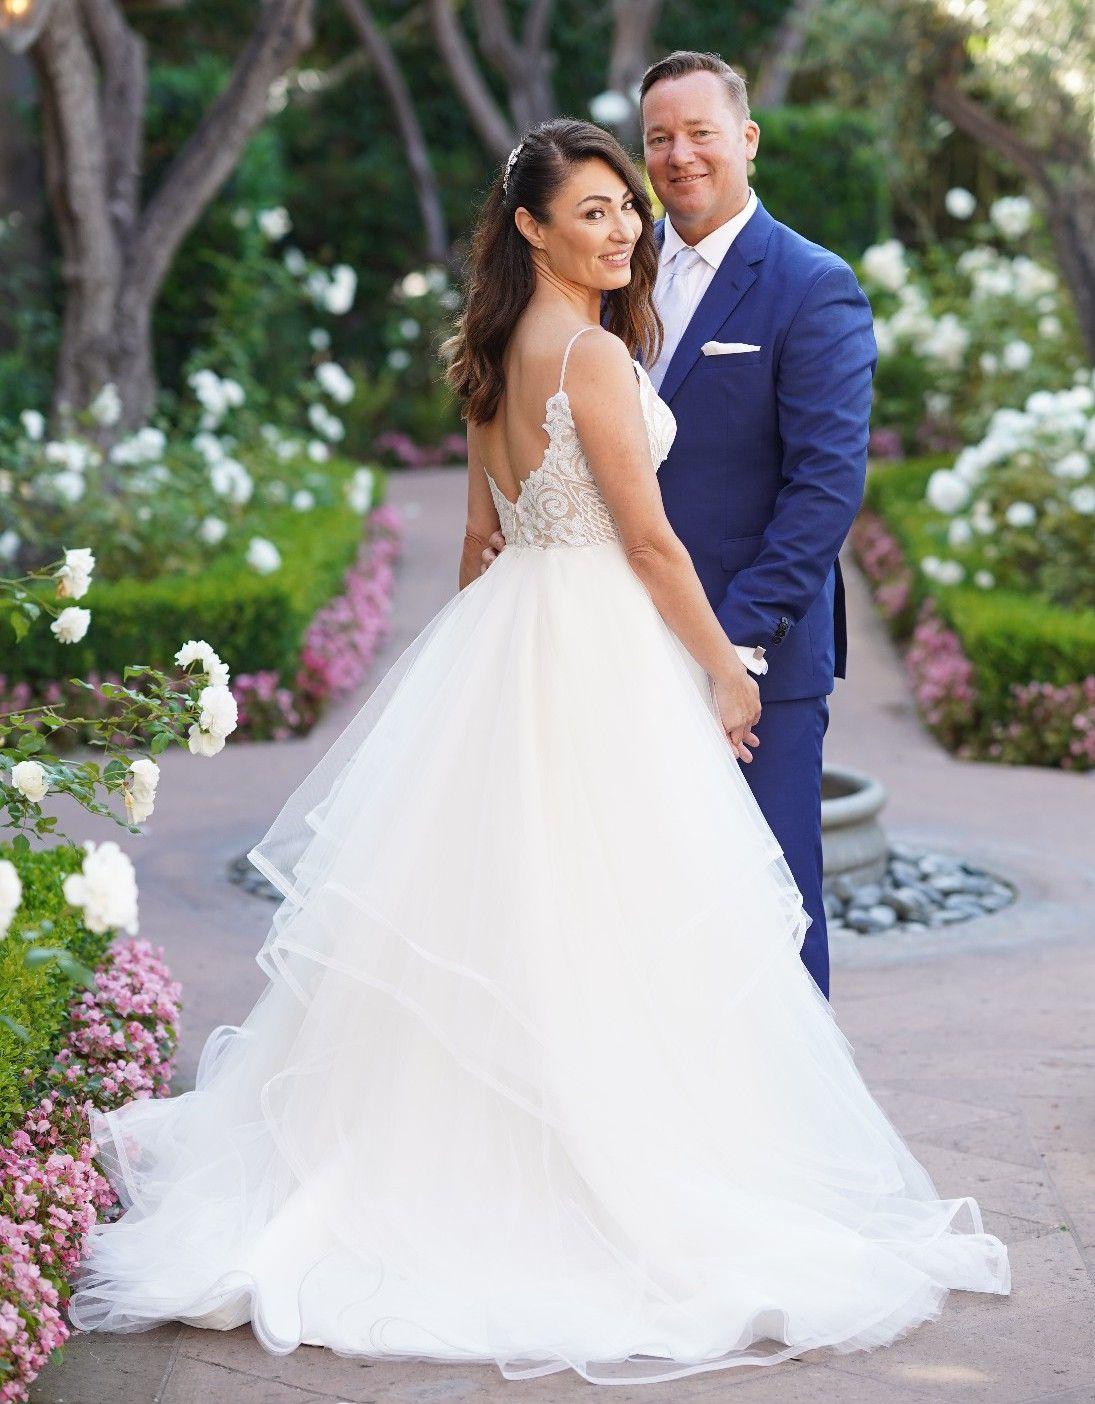 Hayley Paige Pepper 1700 Preloved Wedding Dress Save 64 Preloved Wedding Dresses Wedding Dresses Bridal Ball Gown [ 1404 x 1095 Pixel ]